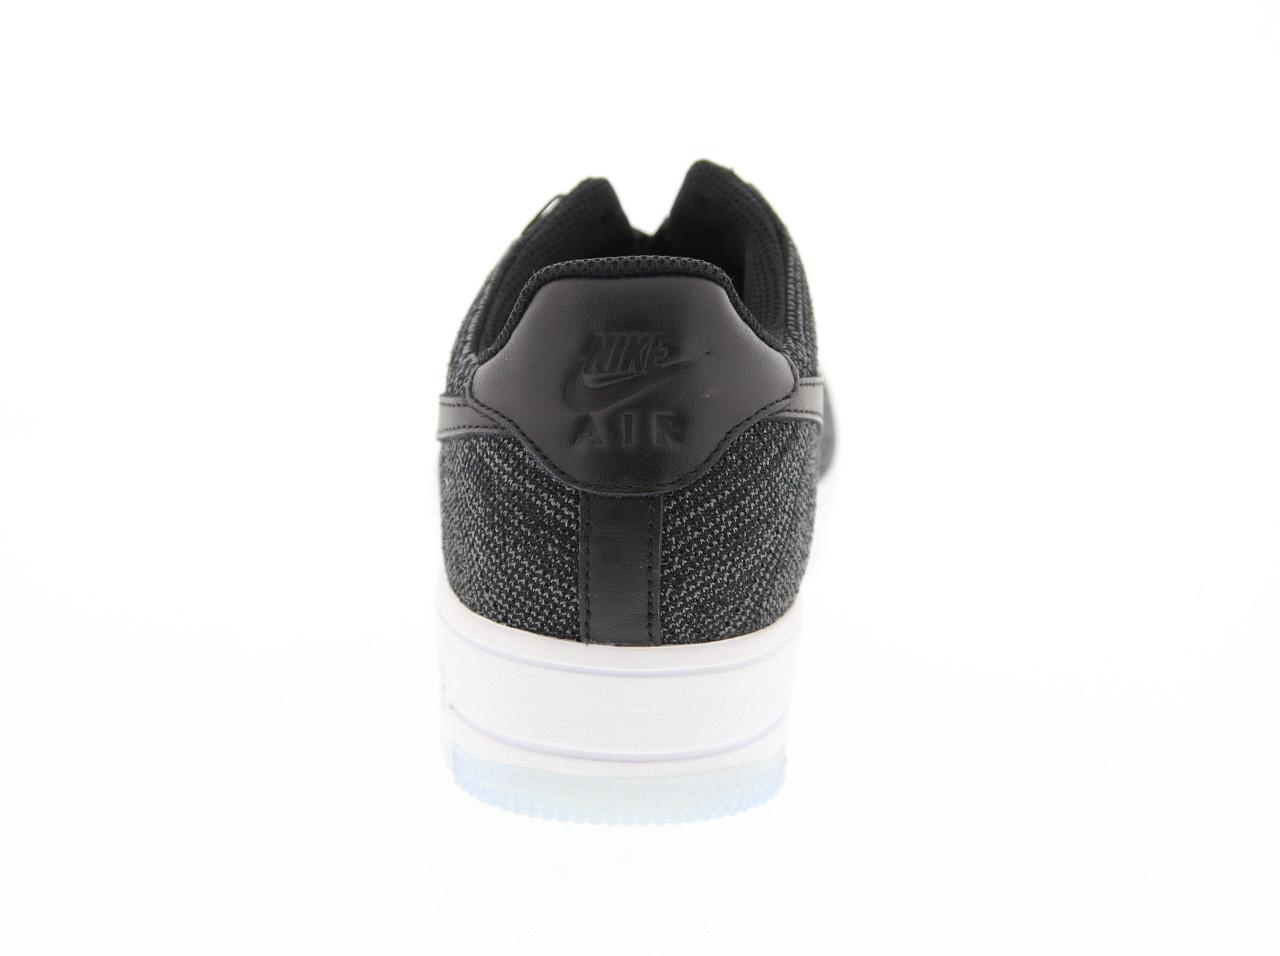 Nike Air Force 1 Flyknit Nero / Nero / Grigio Scuro / Bianco UnfaAT652